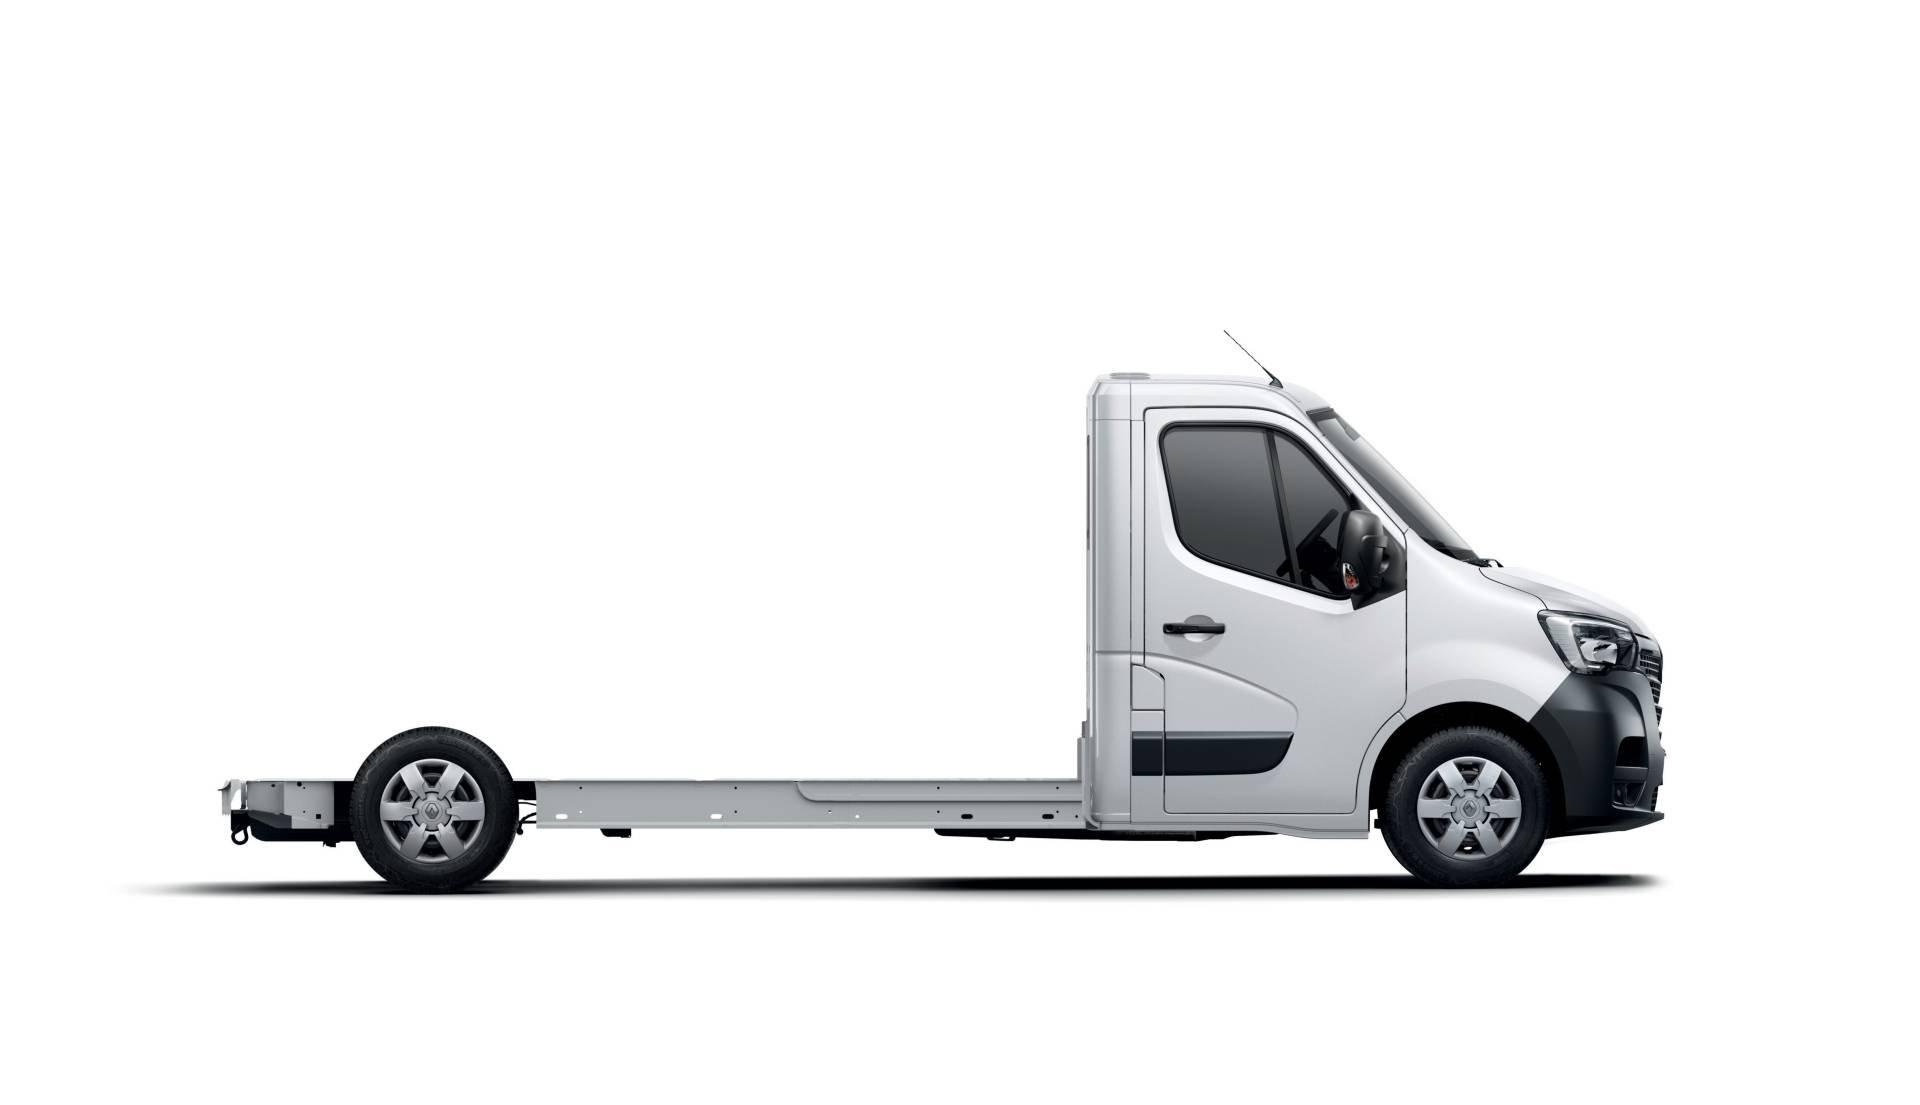 d4c4028b-2019my-renault-master-van-facelift-12